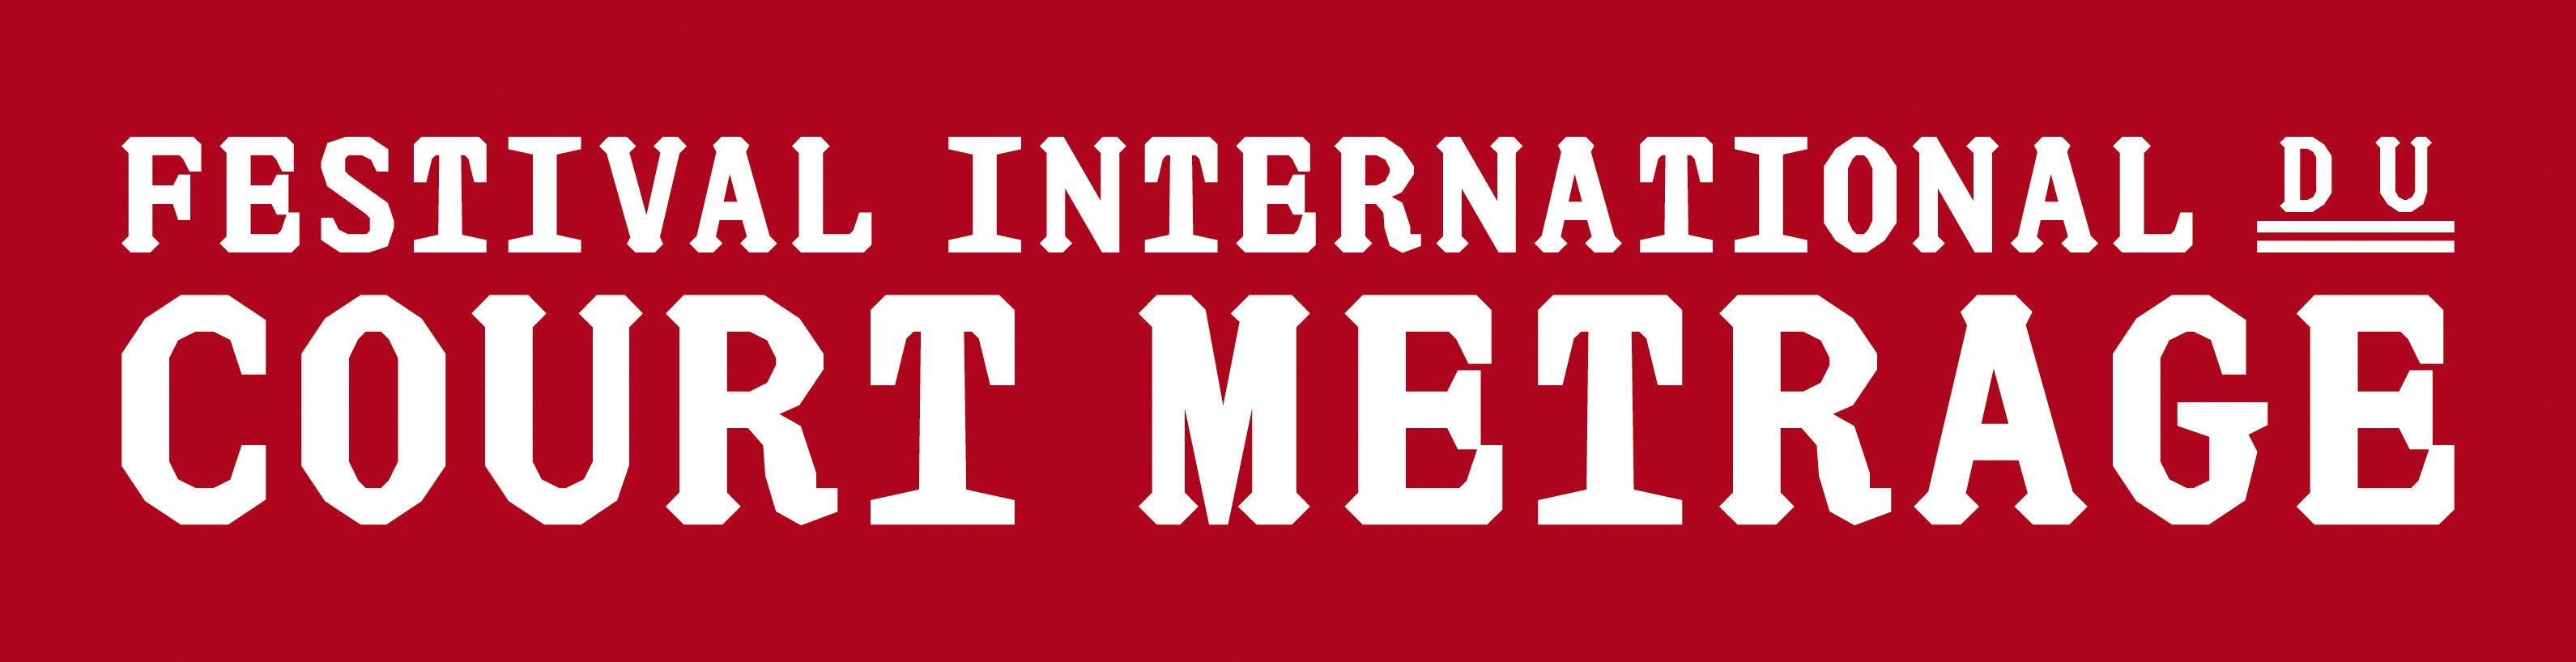 FESTIVAL INTERNATIONAL DU COURT MÉTRAGE